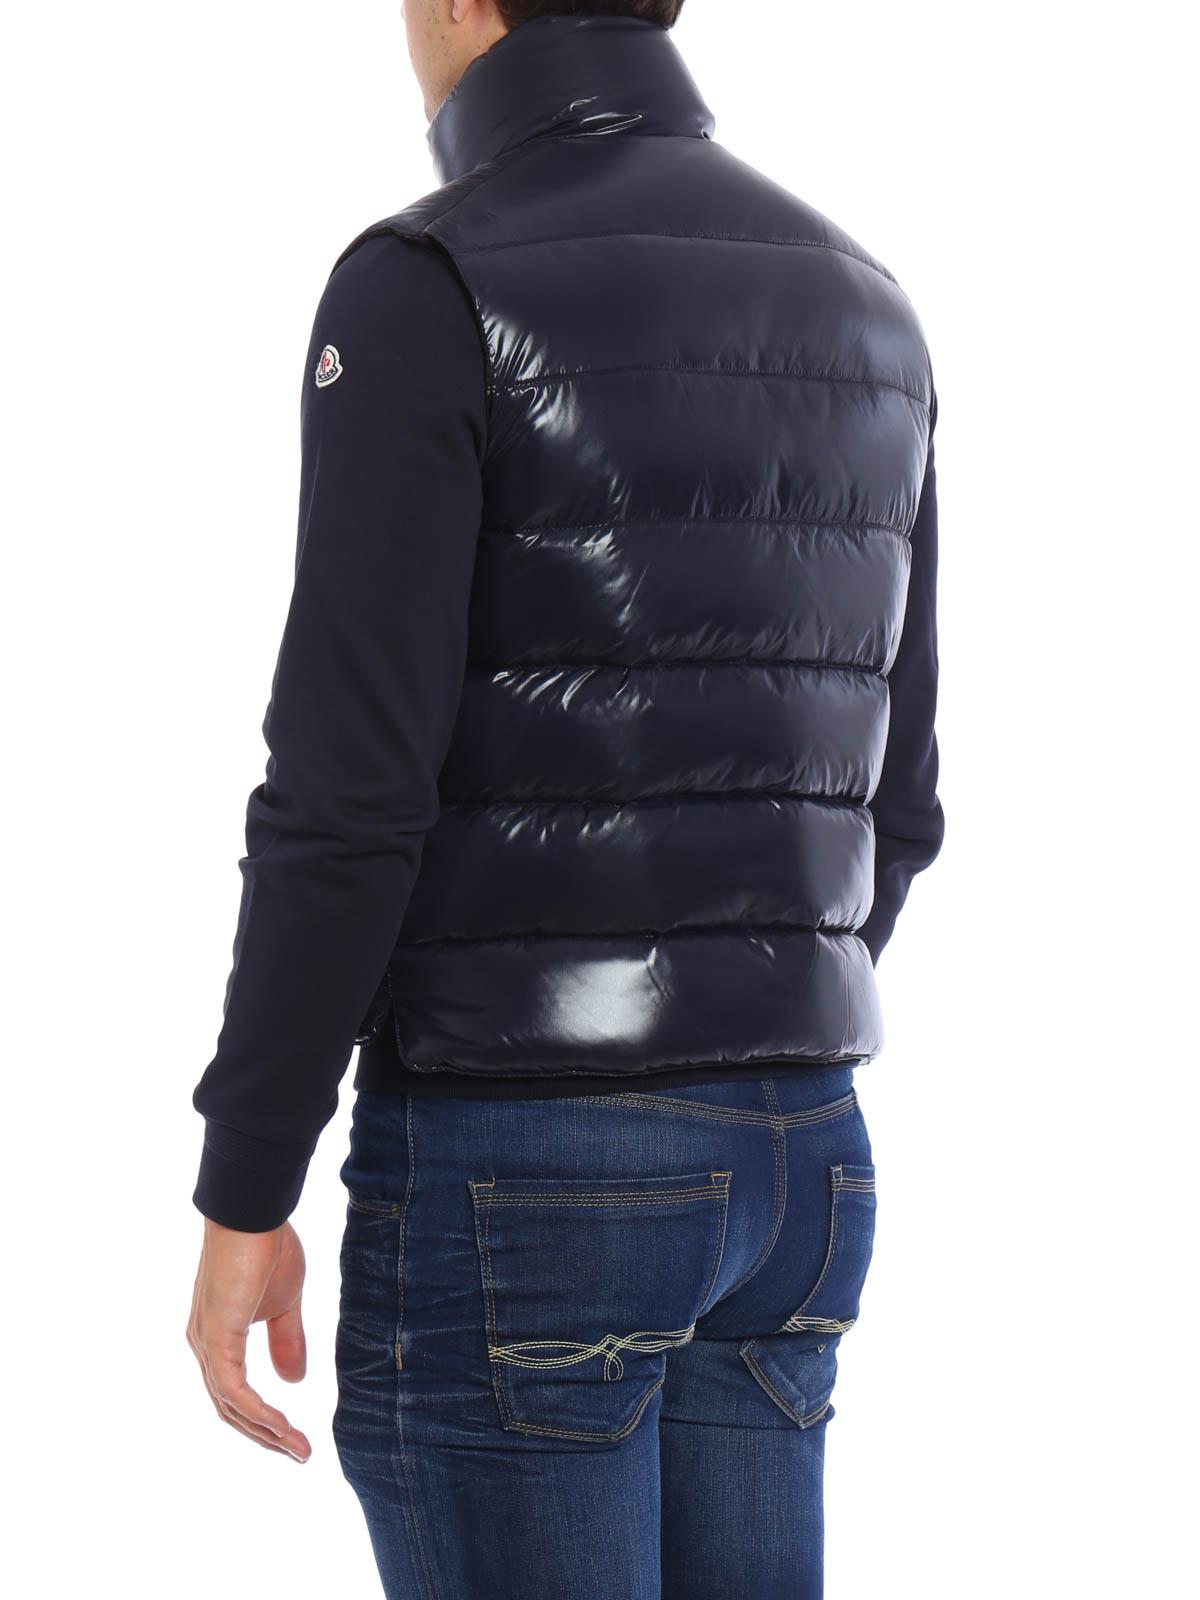 dc8c4204800f Moncler - Tib padded waistcoat - padded jackets - B2 091 4335005 ...